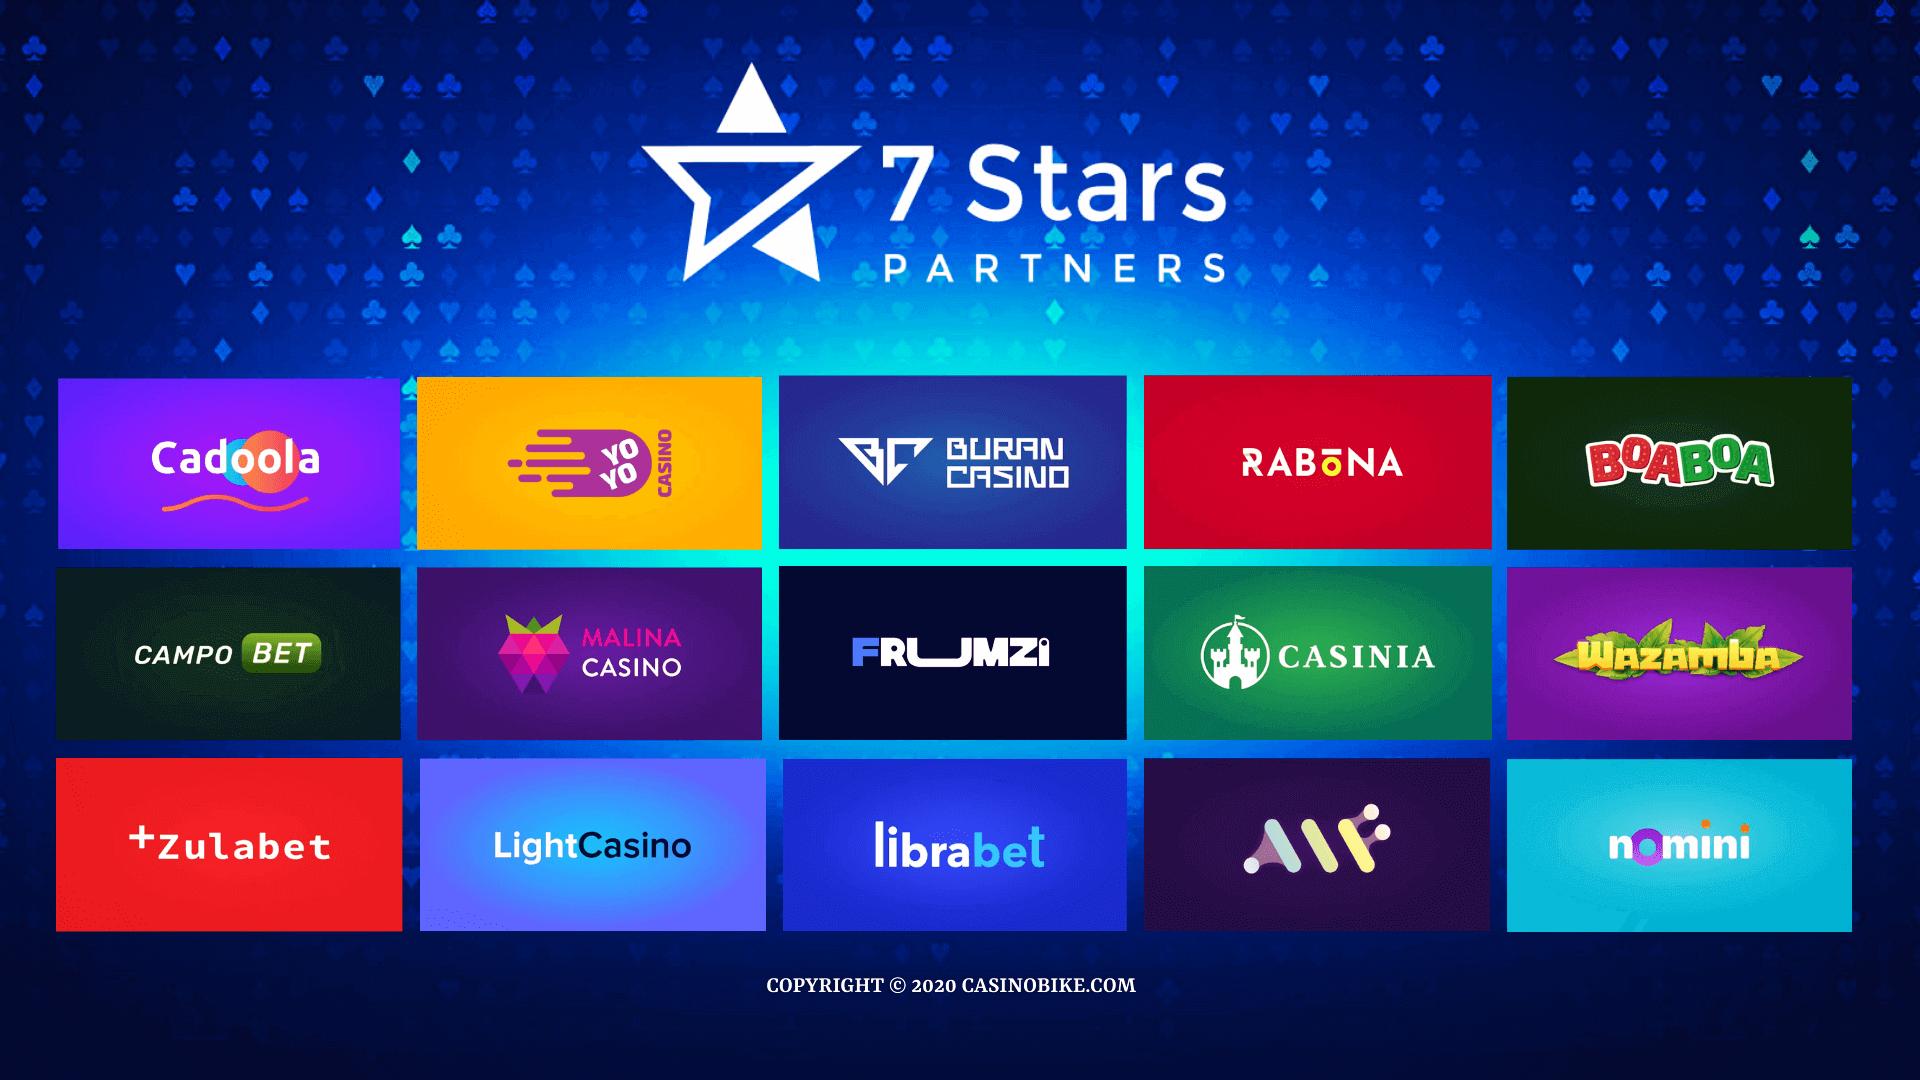 7StarsPartners operates 15 online casino brands